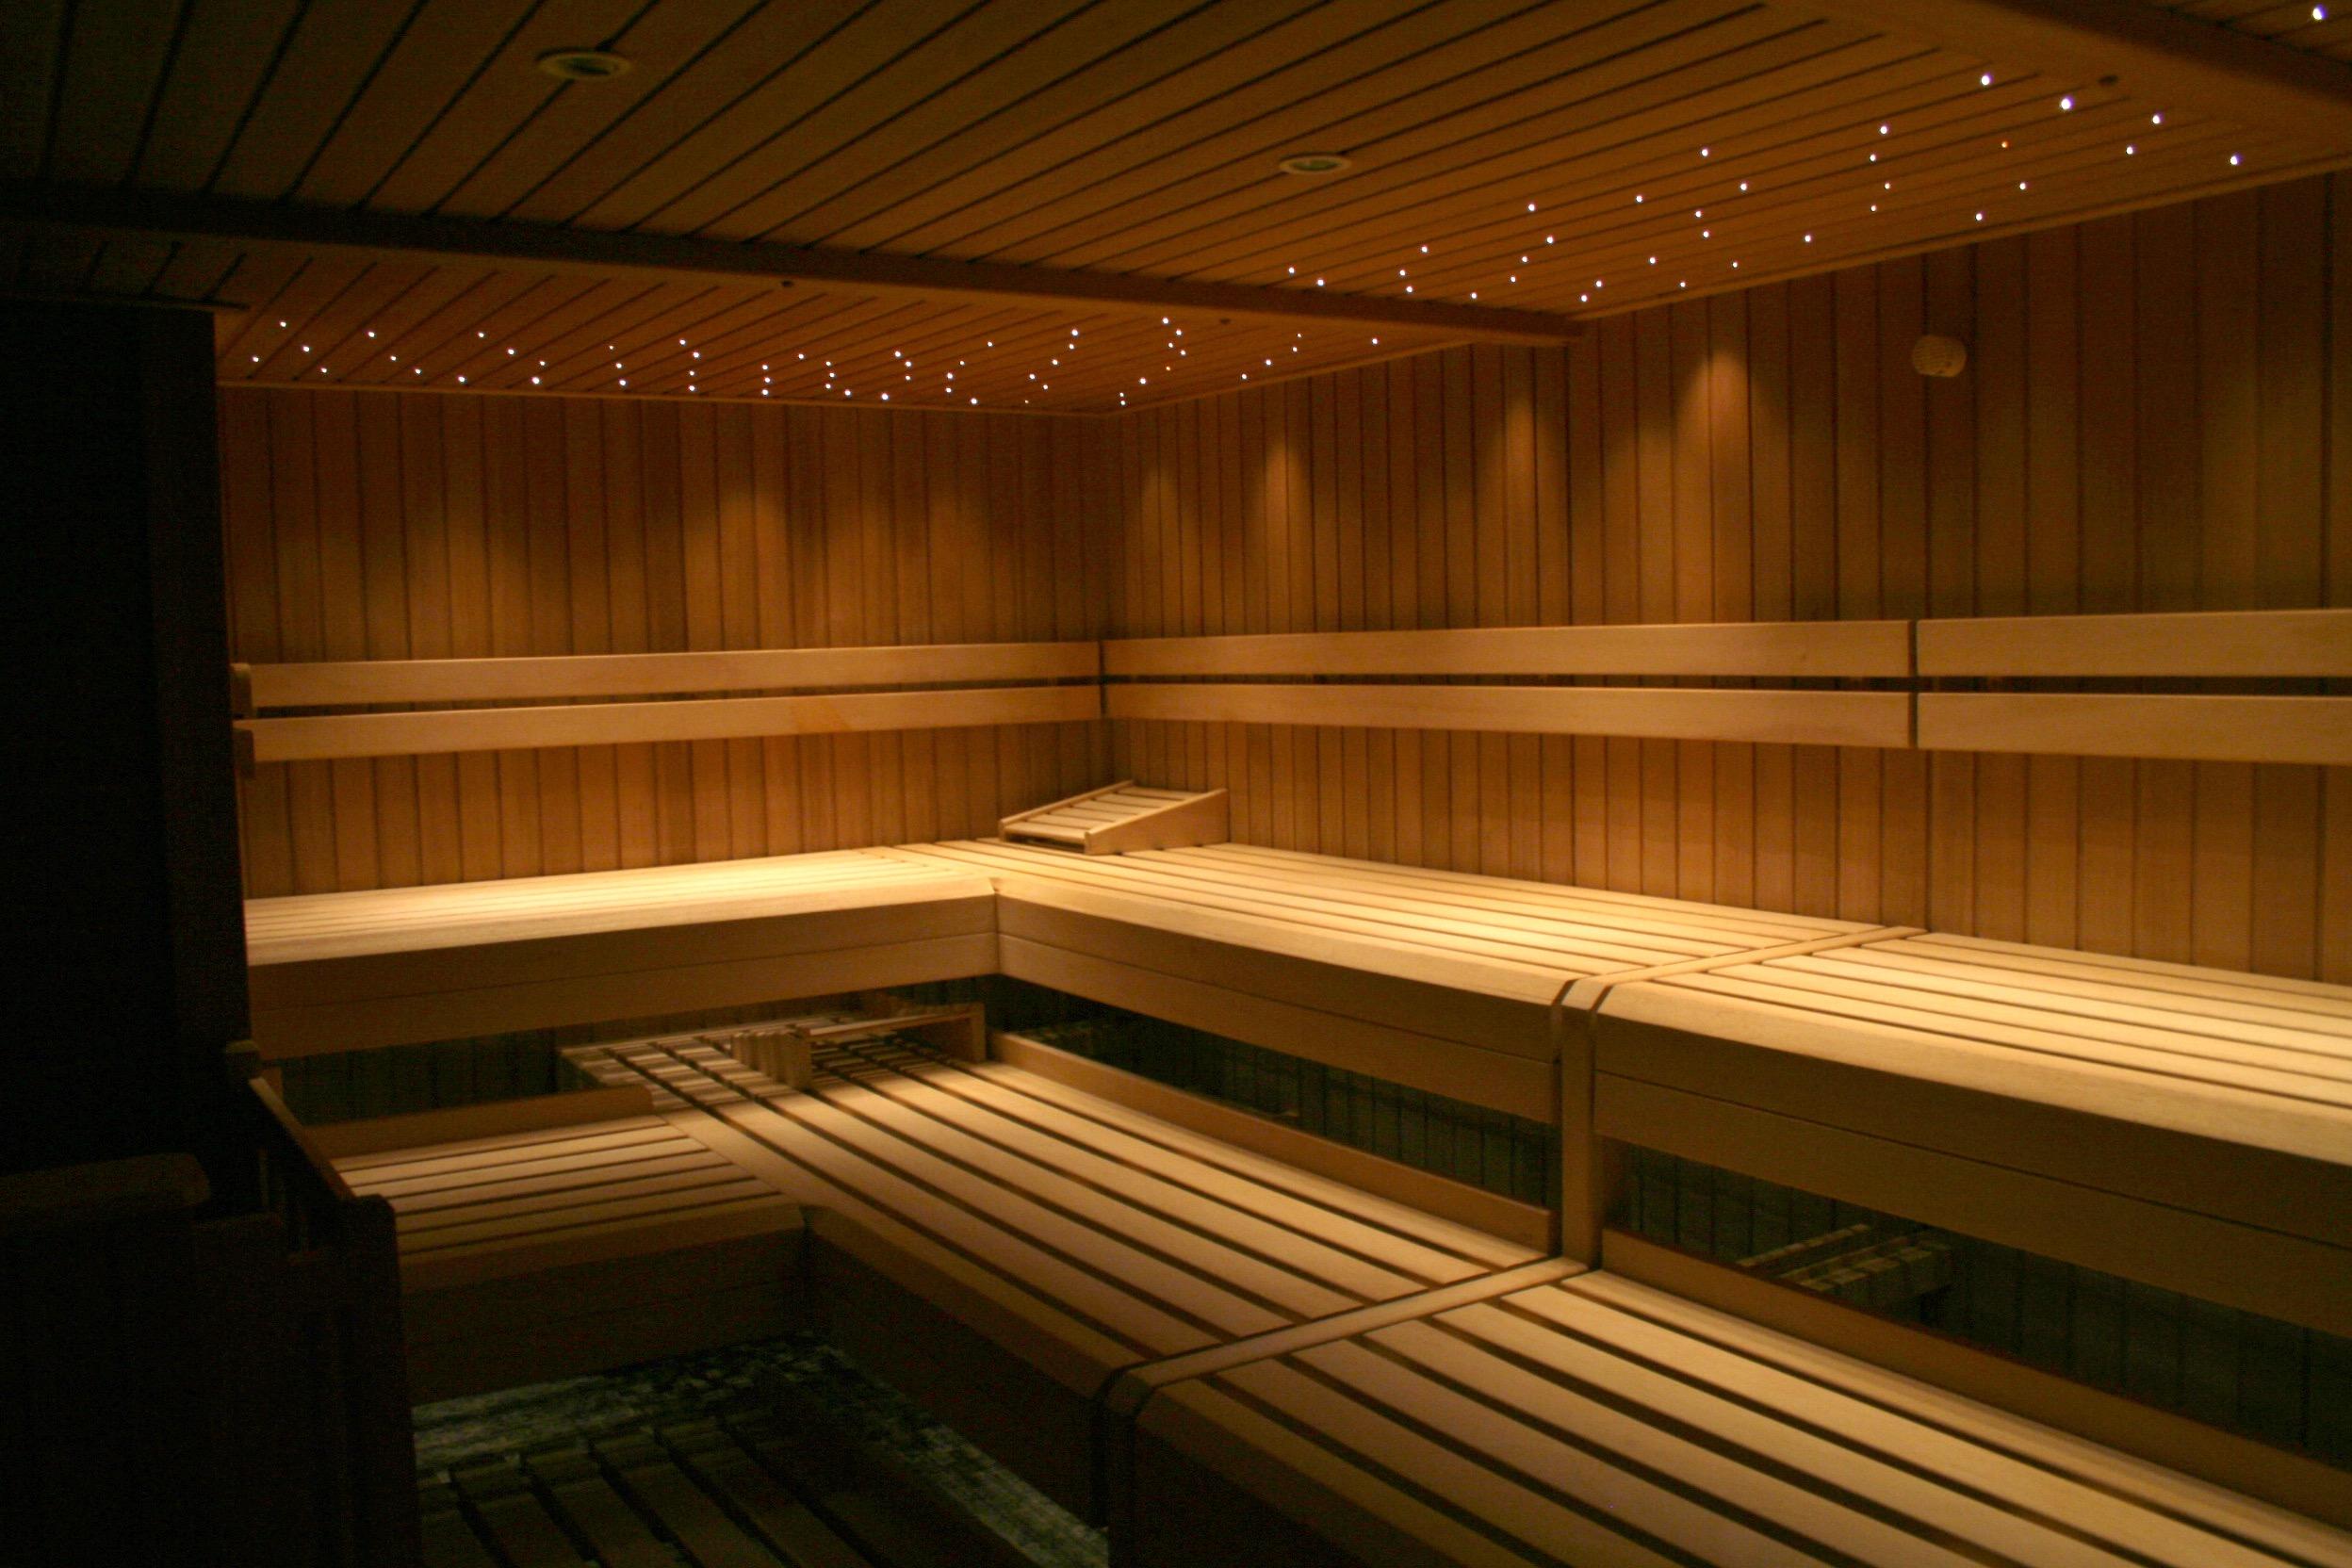 grosse Finnische Sauna